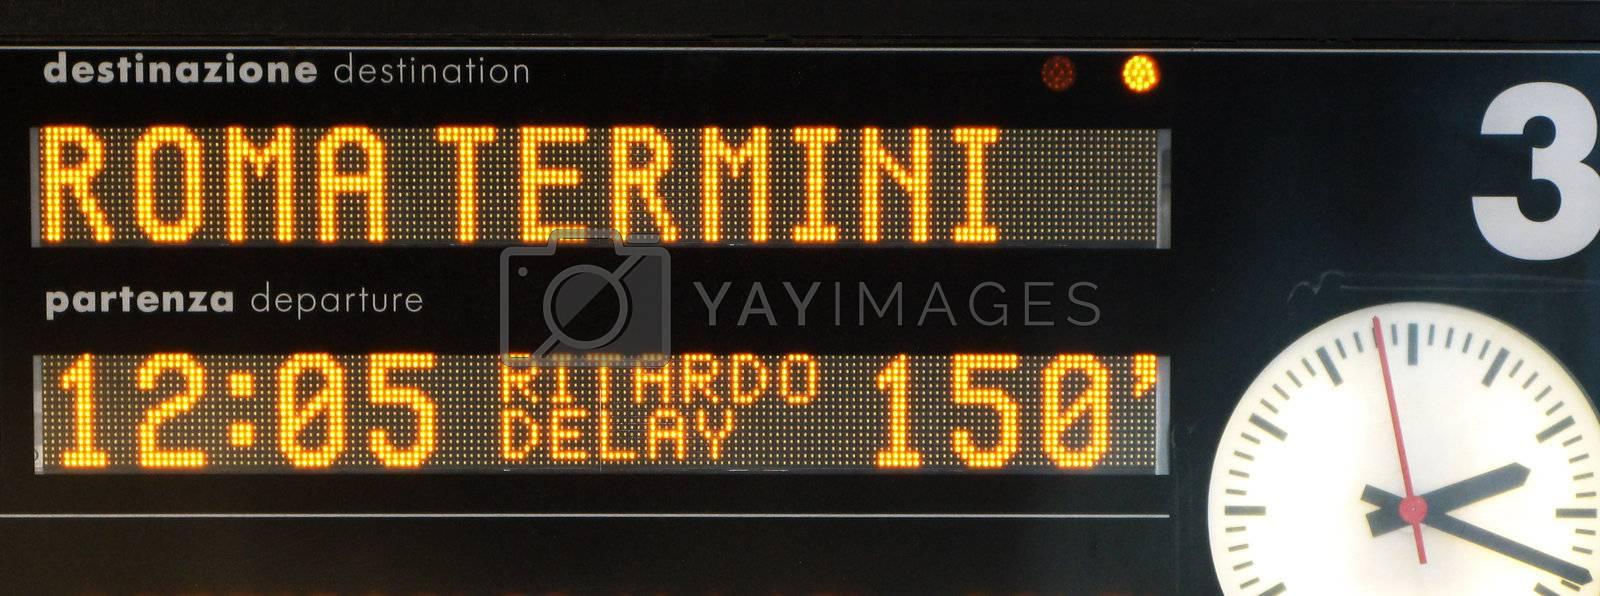 Timetable about train to Rome Termini, delay 150 minutes!